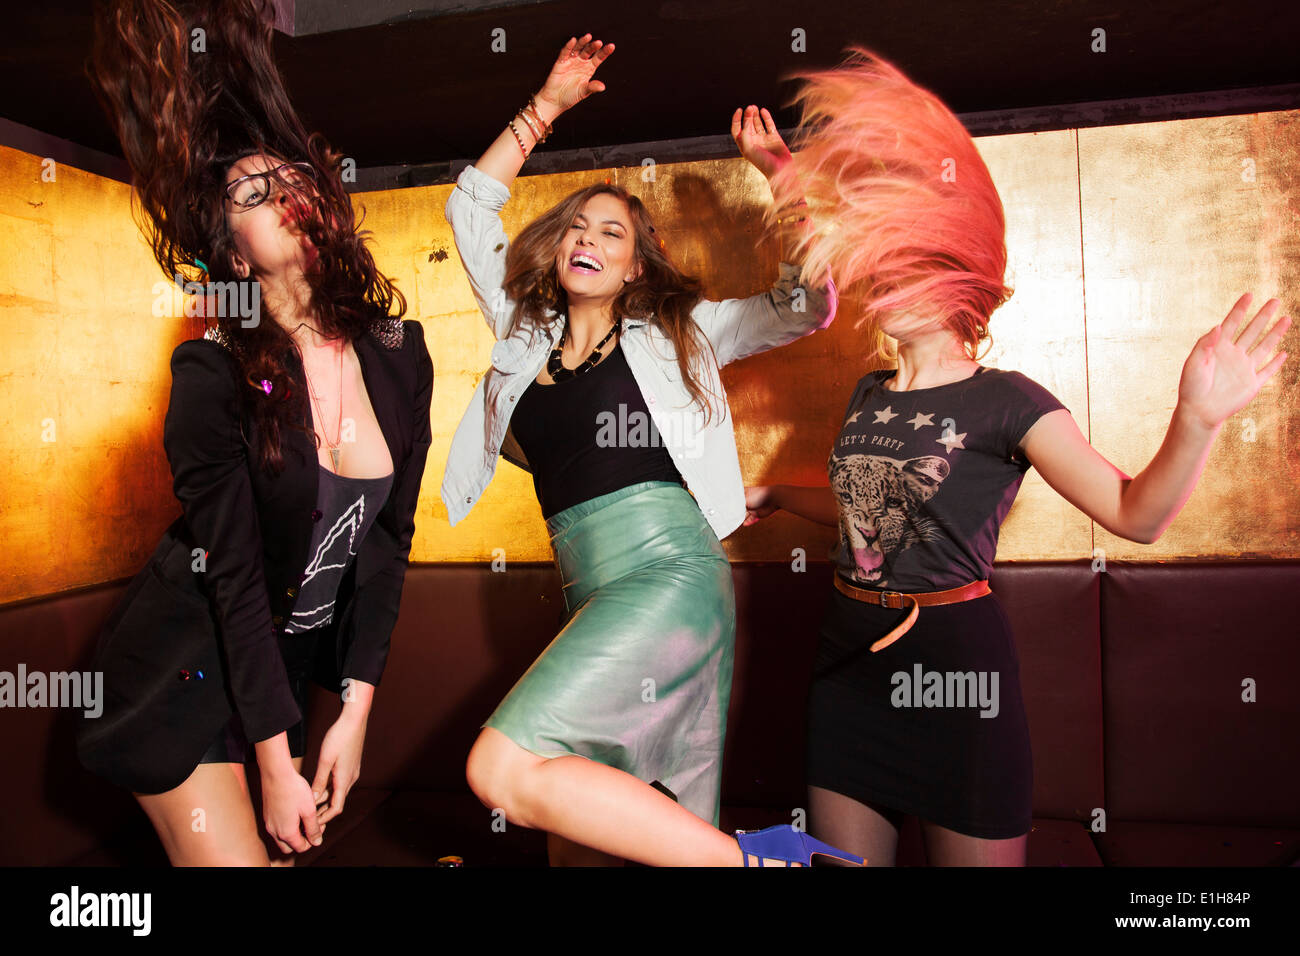 Vier Freundinnen Tanzen in Nachtclub Stockbild